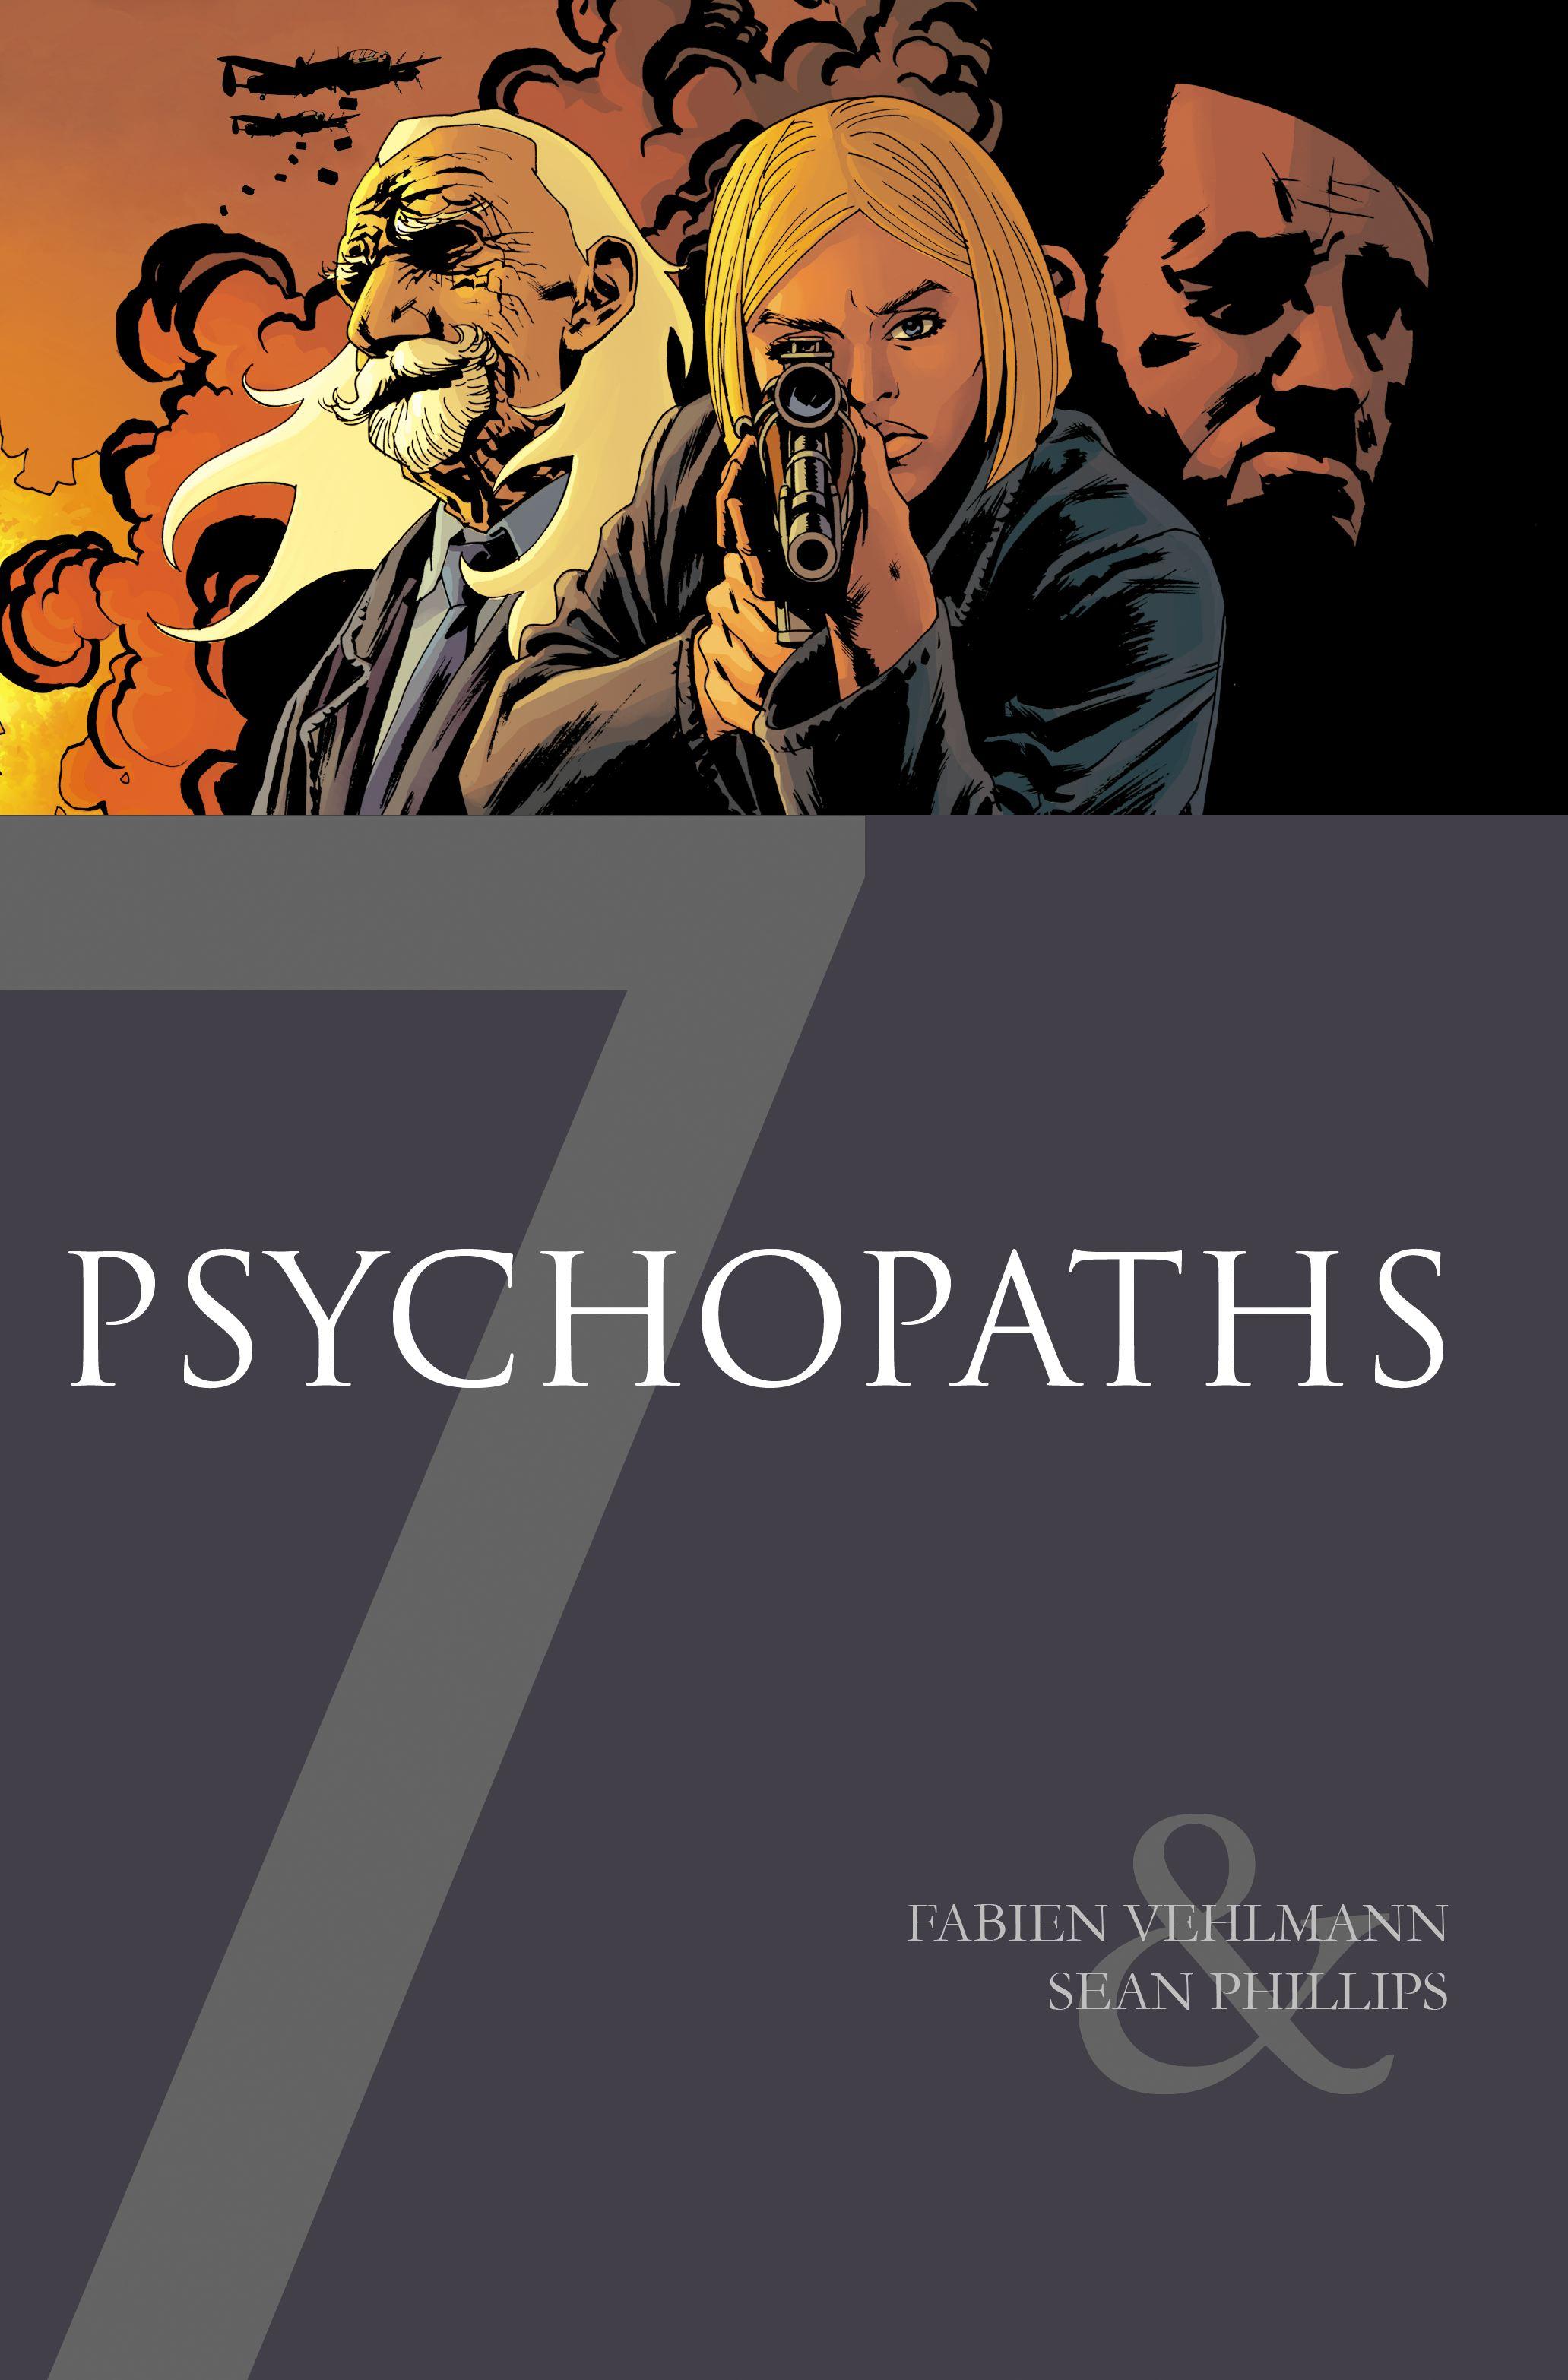 7 psychopaths 9781608860326 hr